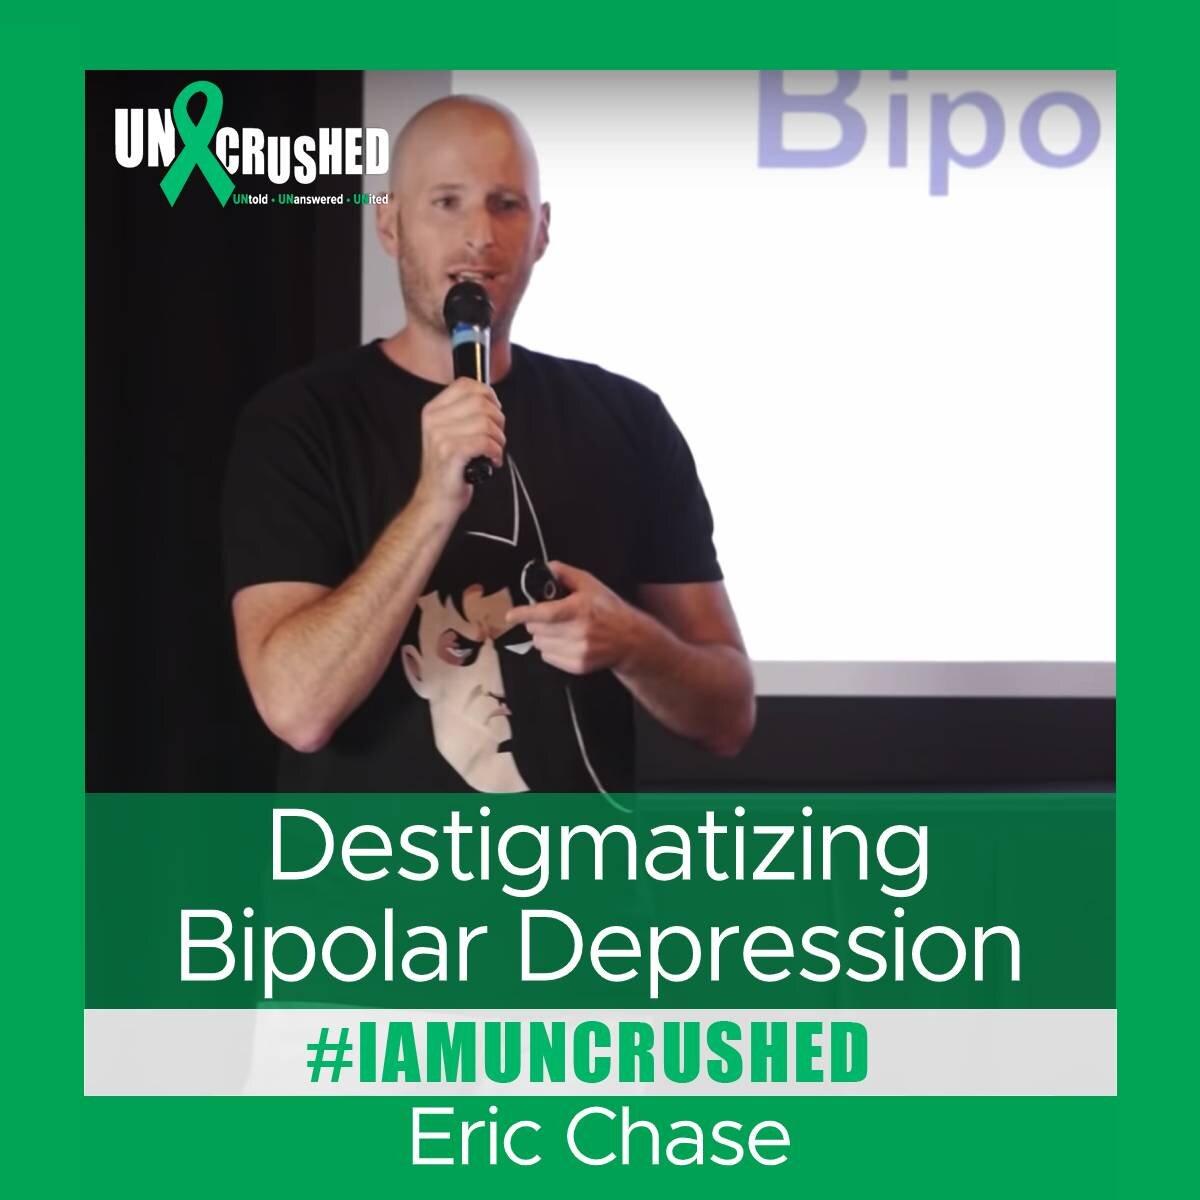 Read  Destigmatizing Bipolar Depression  by Eric Chase.